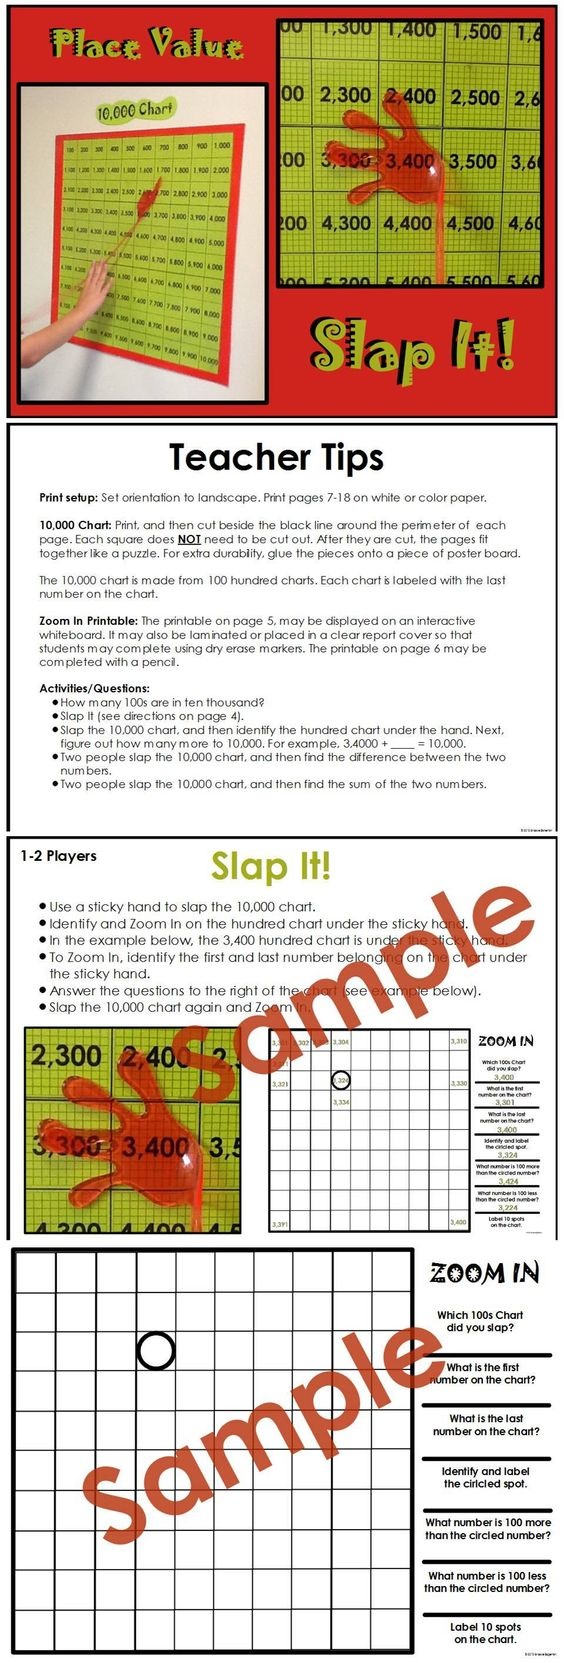 Place Value Activity Place Value Activities Place Values Math Resources